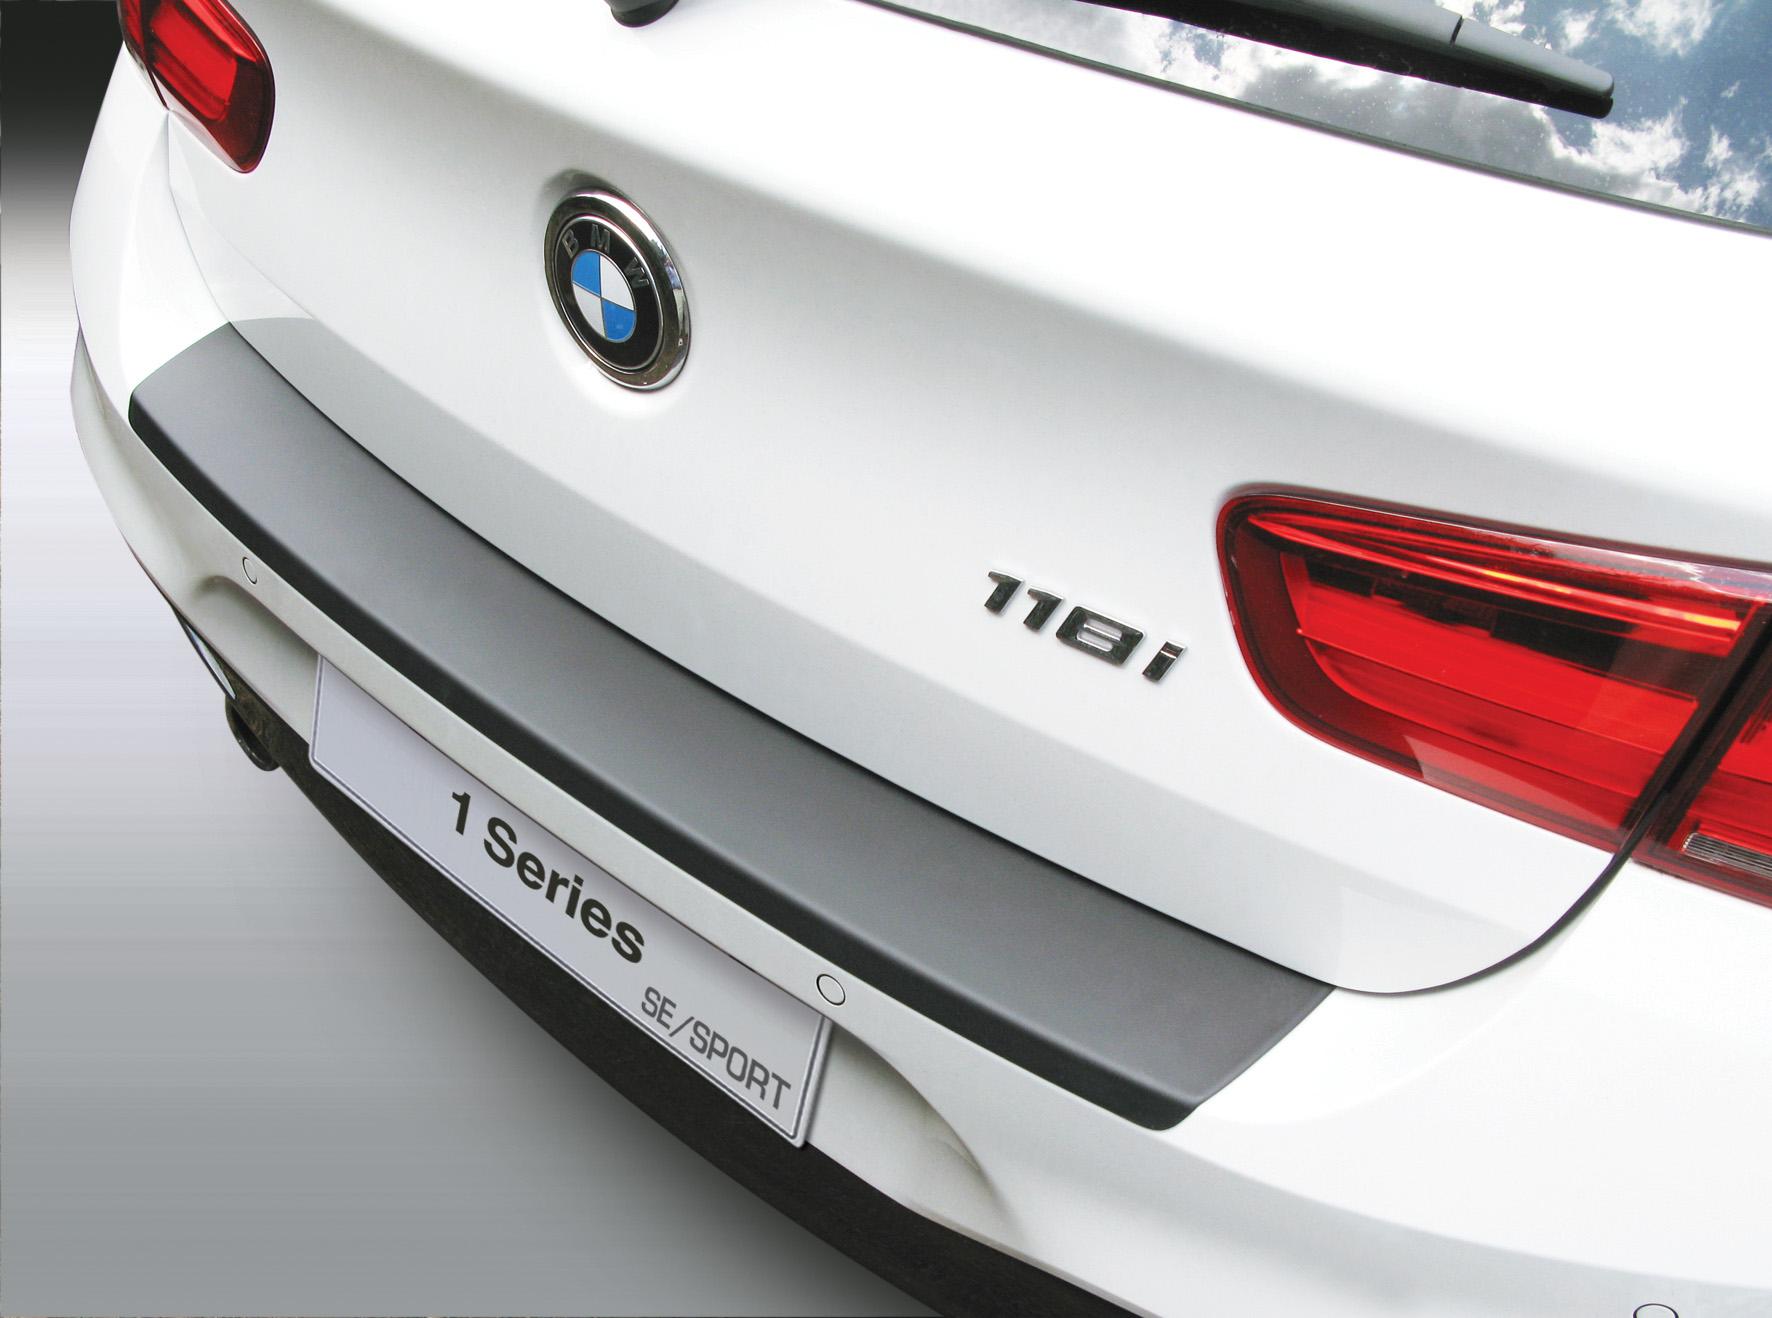 Накладка на задний бампер  BMW 1 серии, 3/5-дв. хэтчбек, кузов F21, 2015-2018